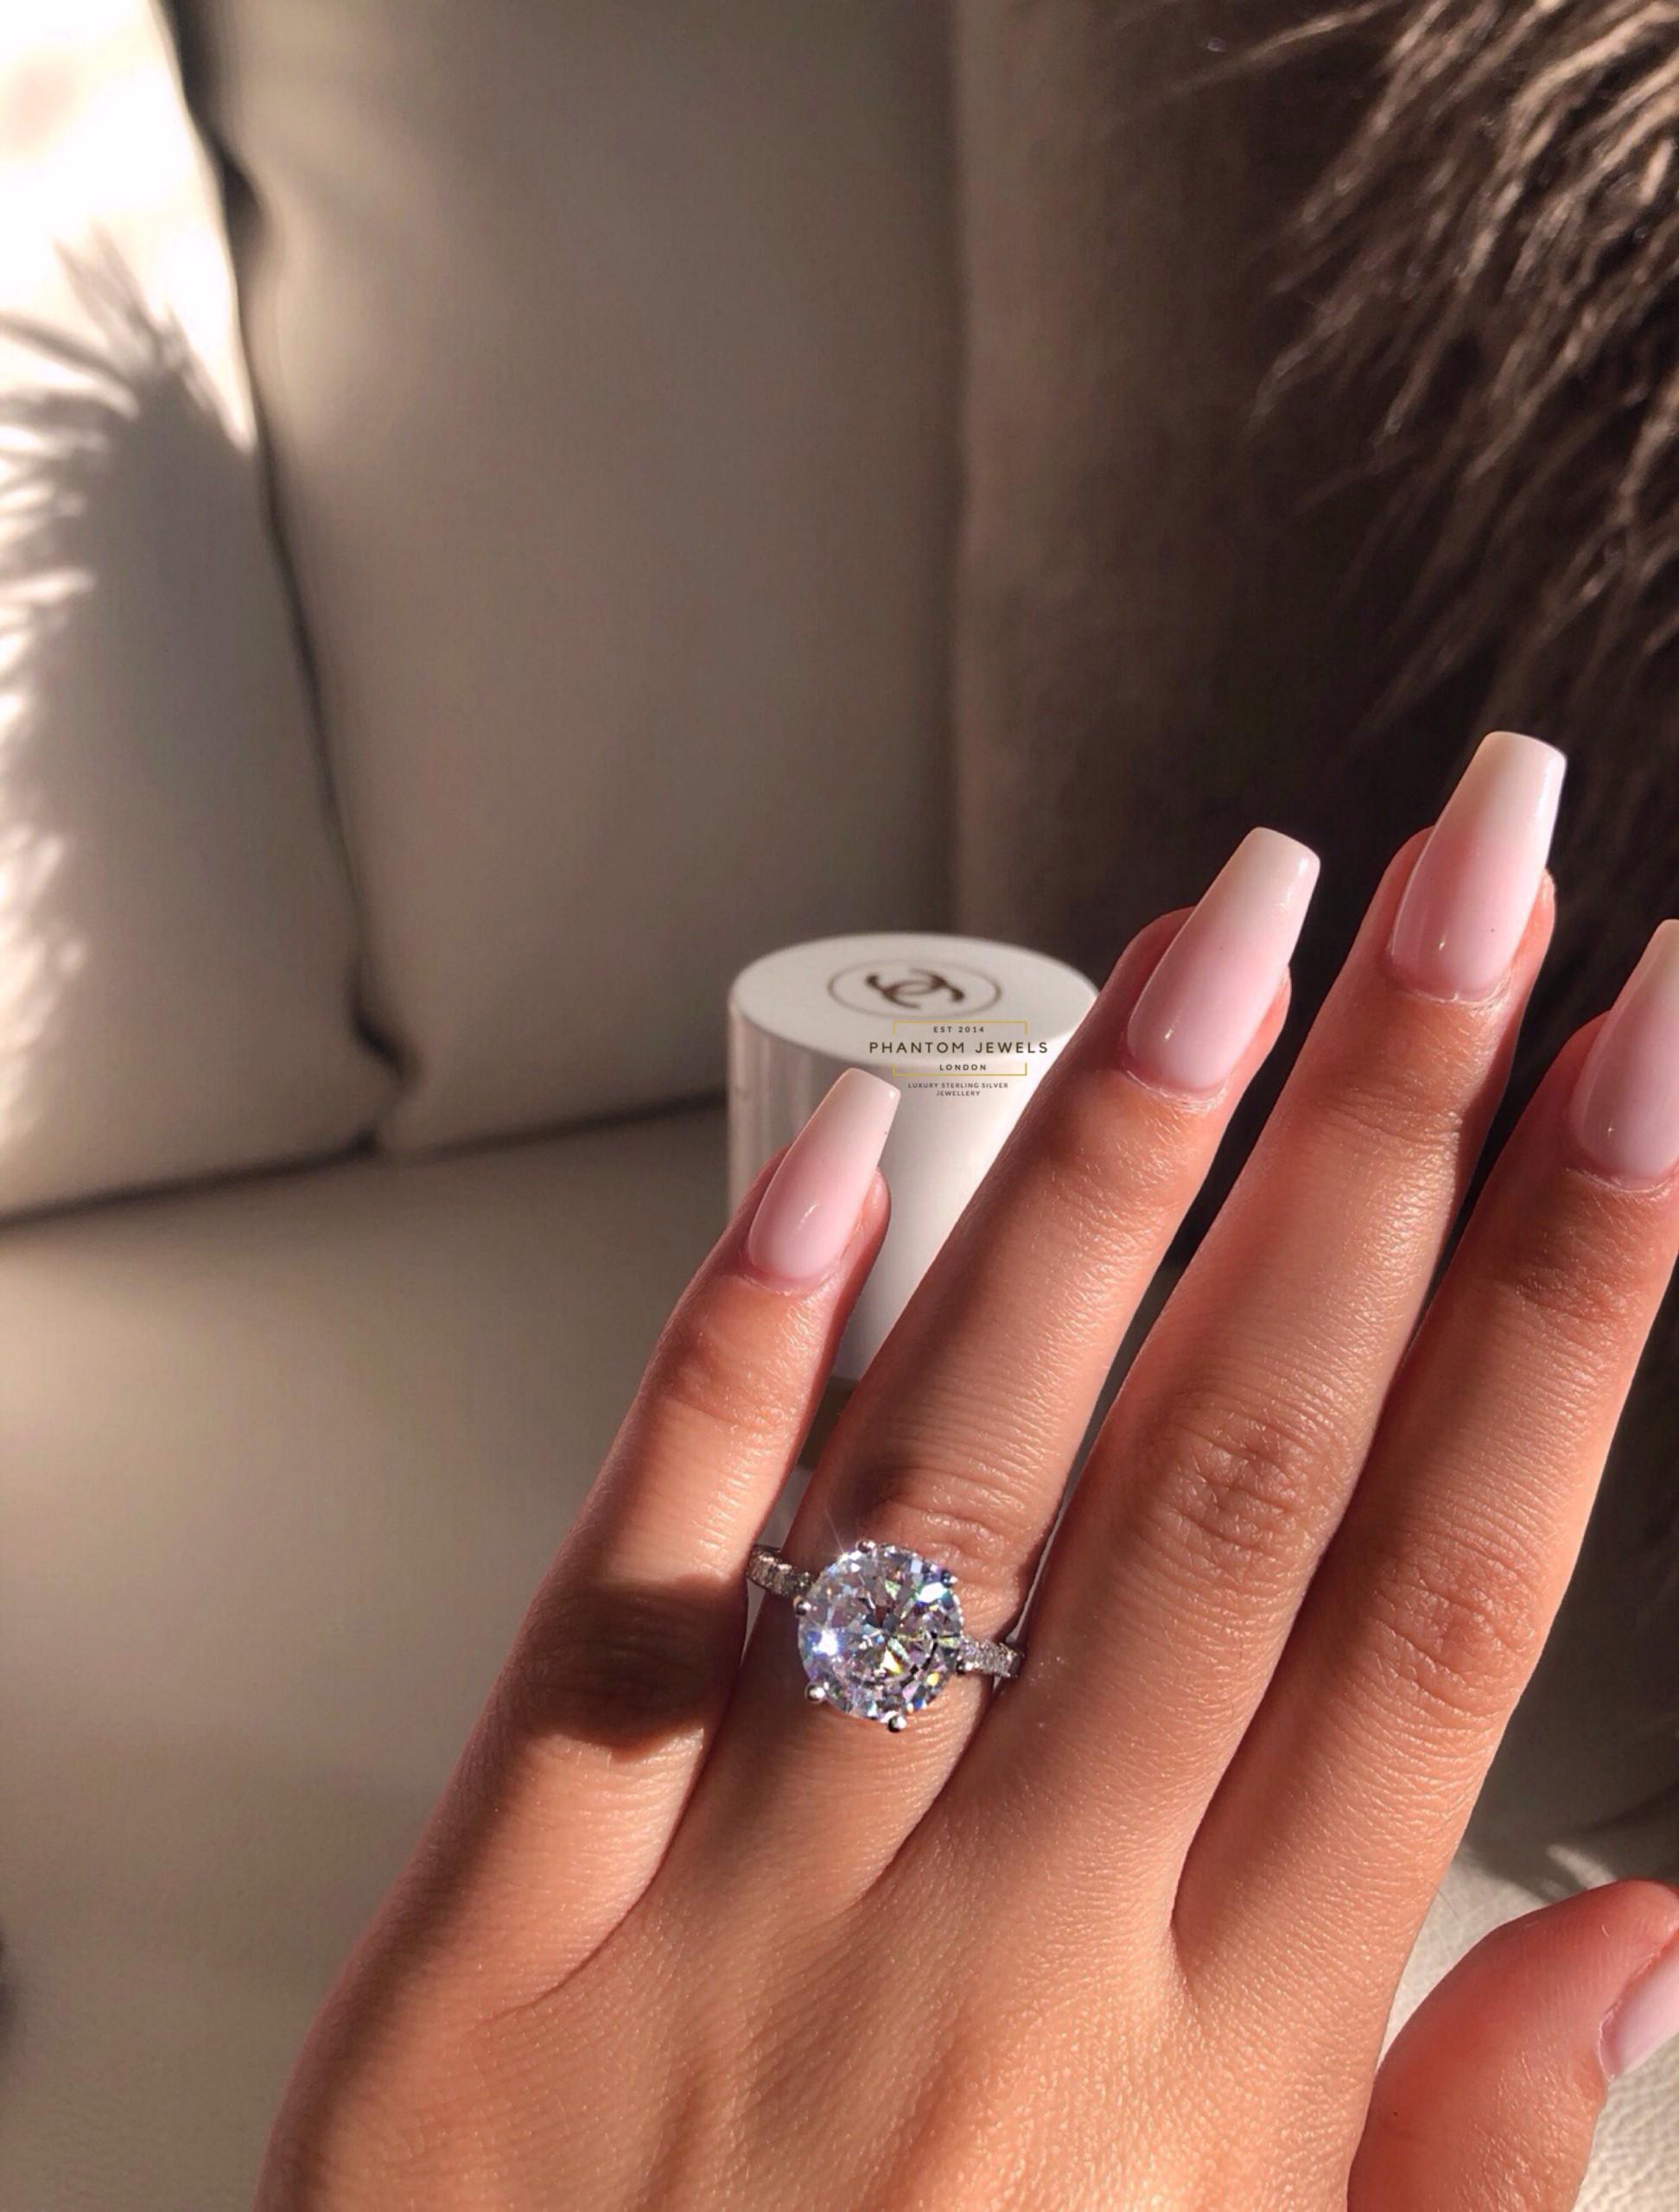 soignee phantom jewels ring